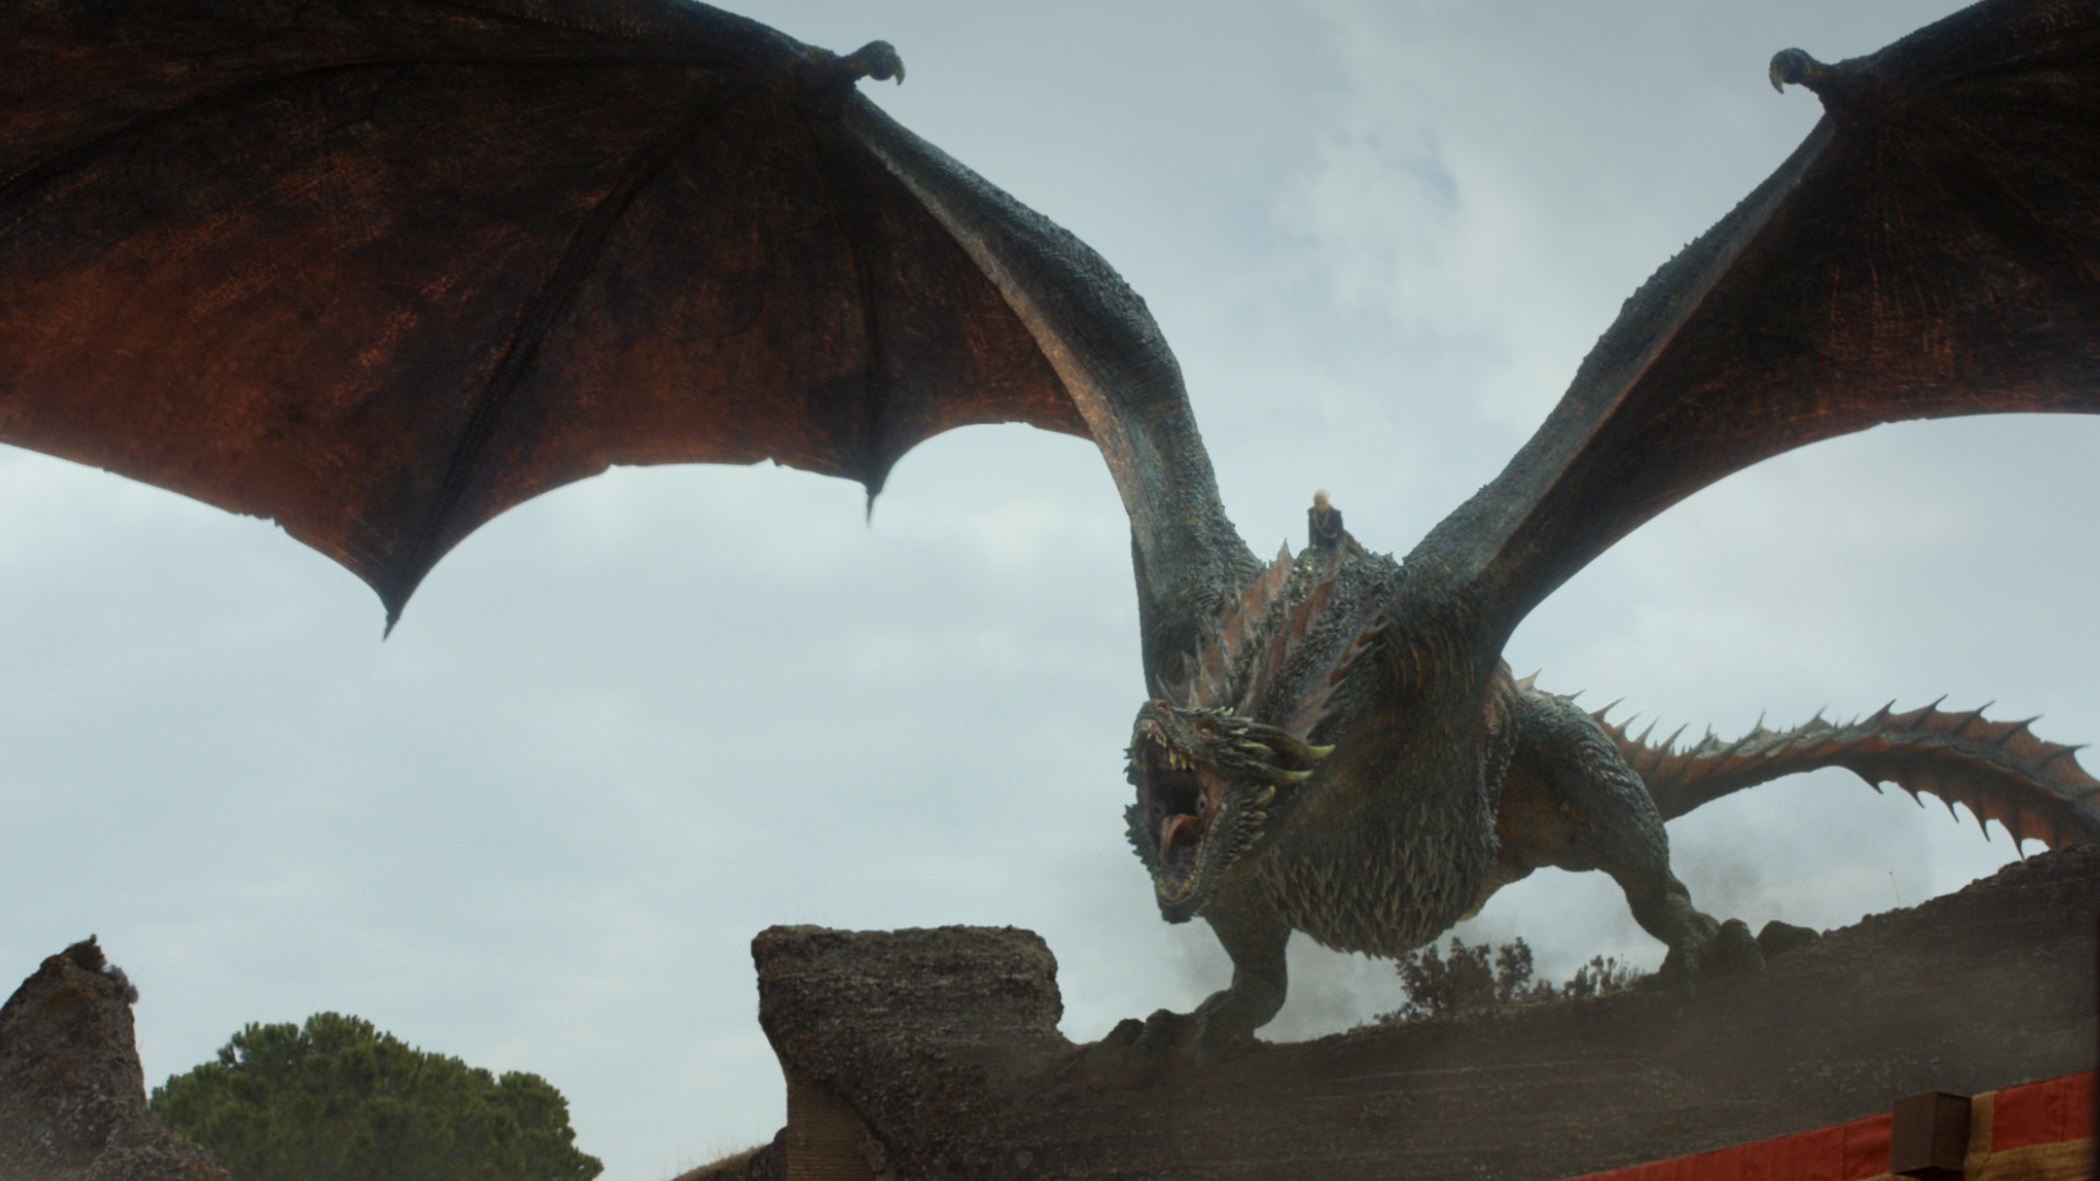 Daenerys arrives